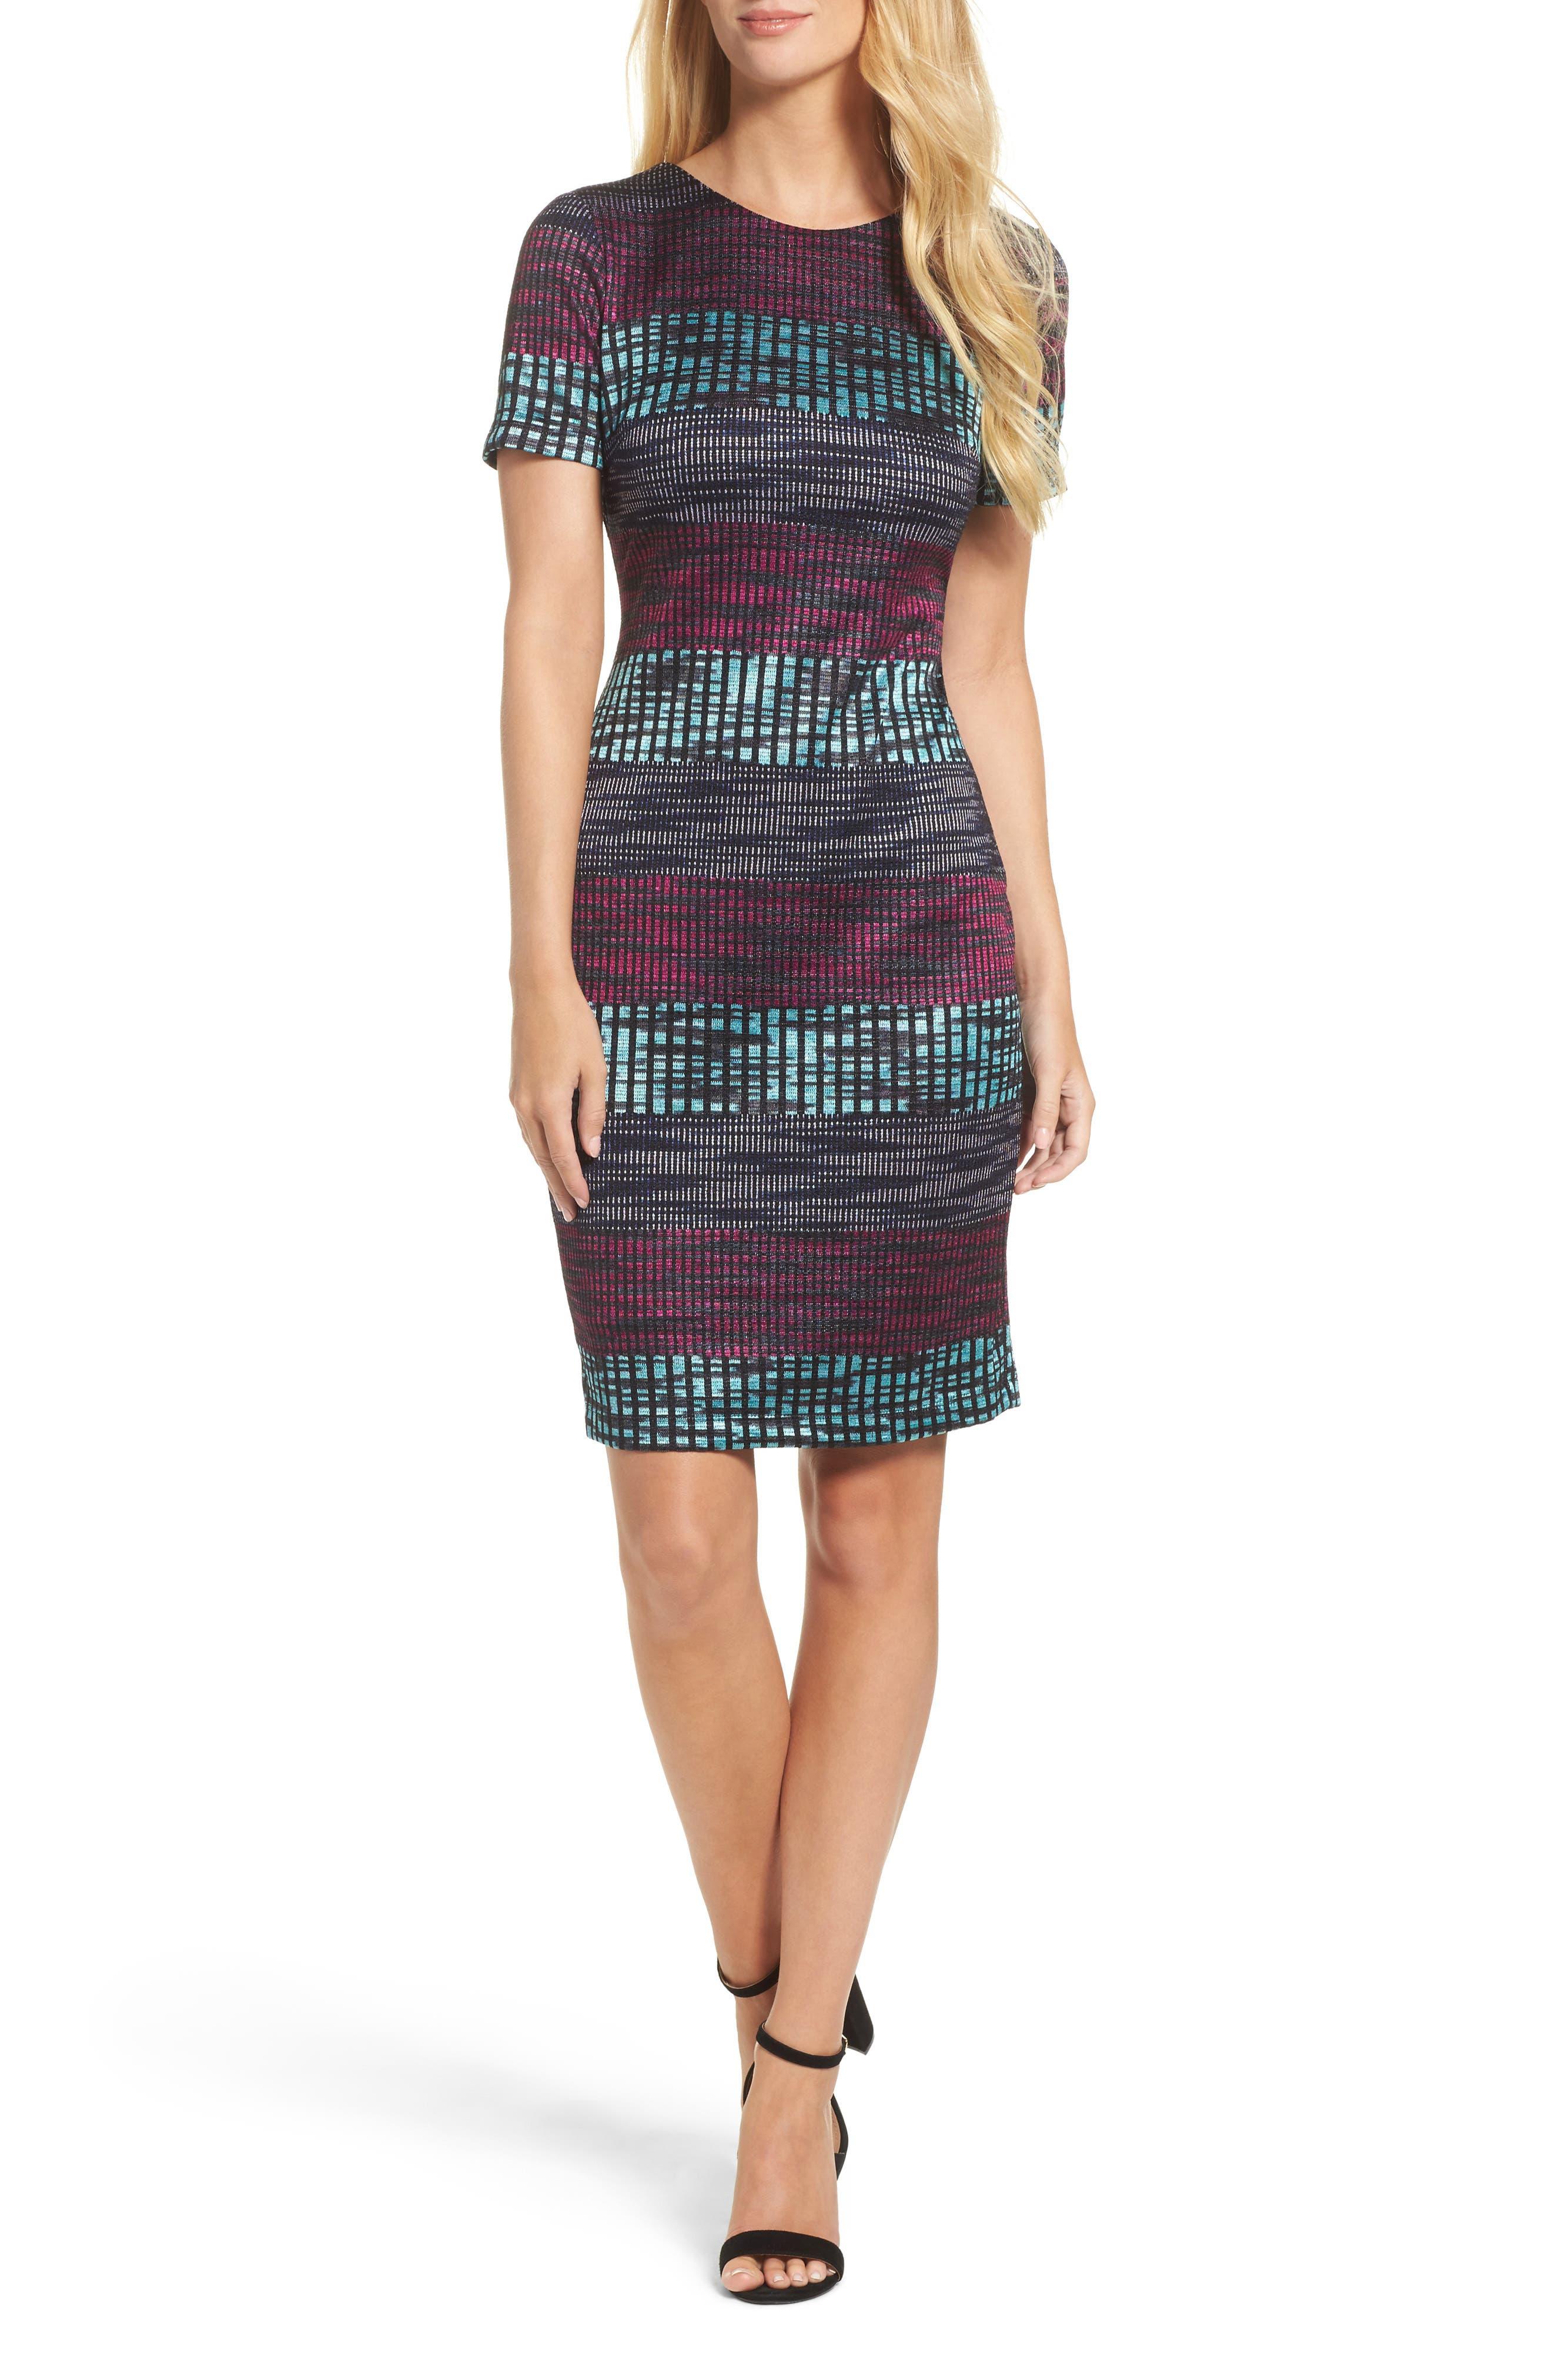 Taylor Dresses Ombré Knit Sheath Dress